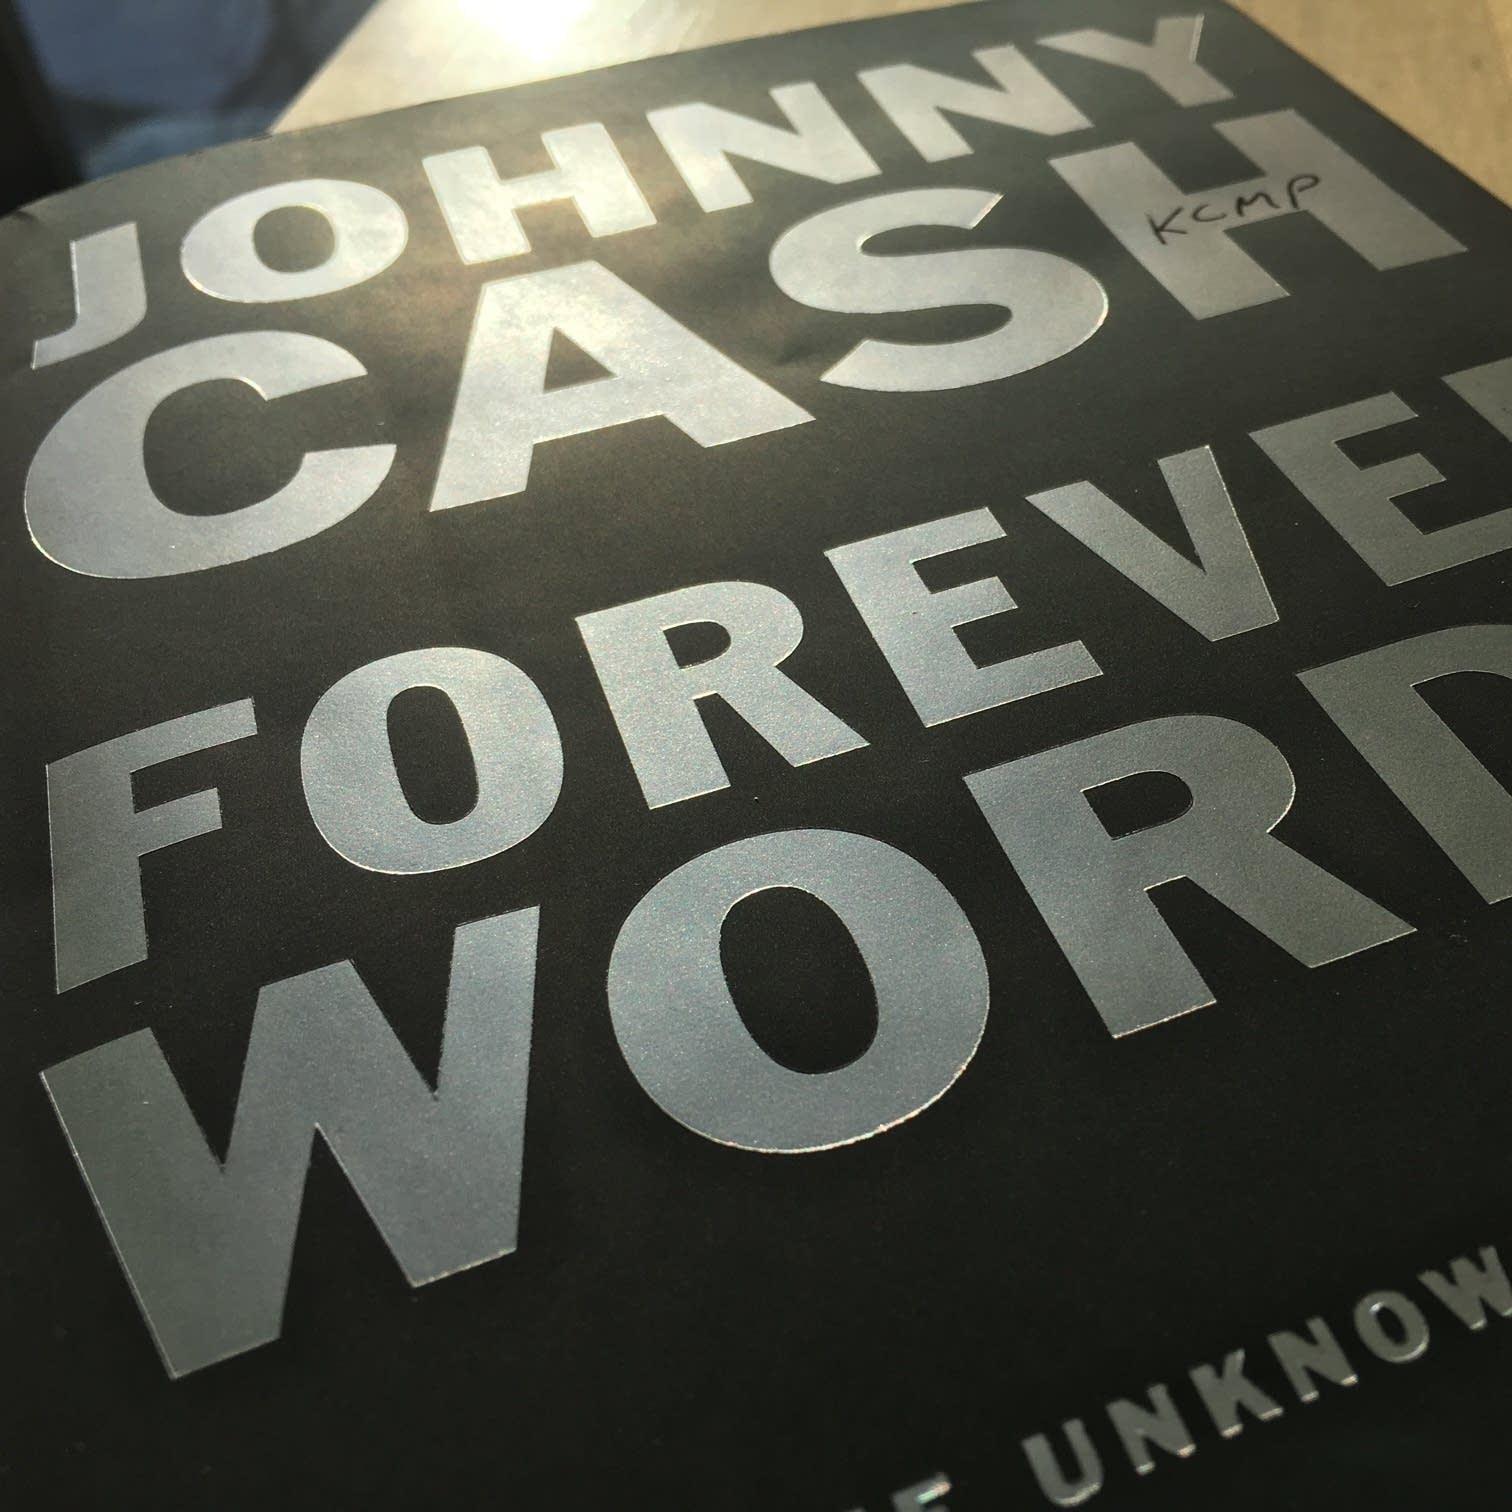 Johnny Cash's 'Forever Words'